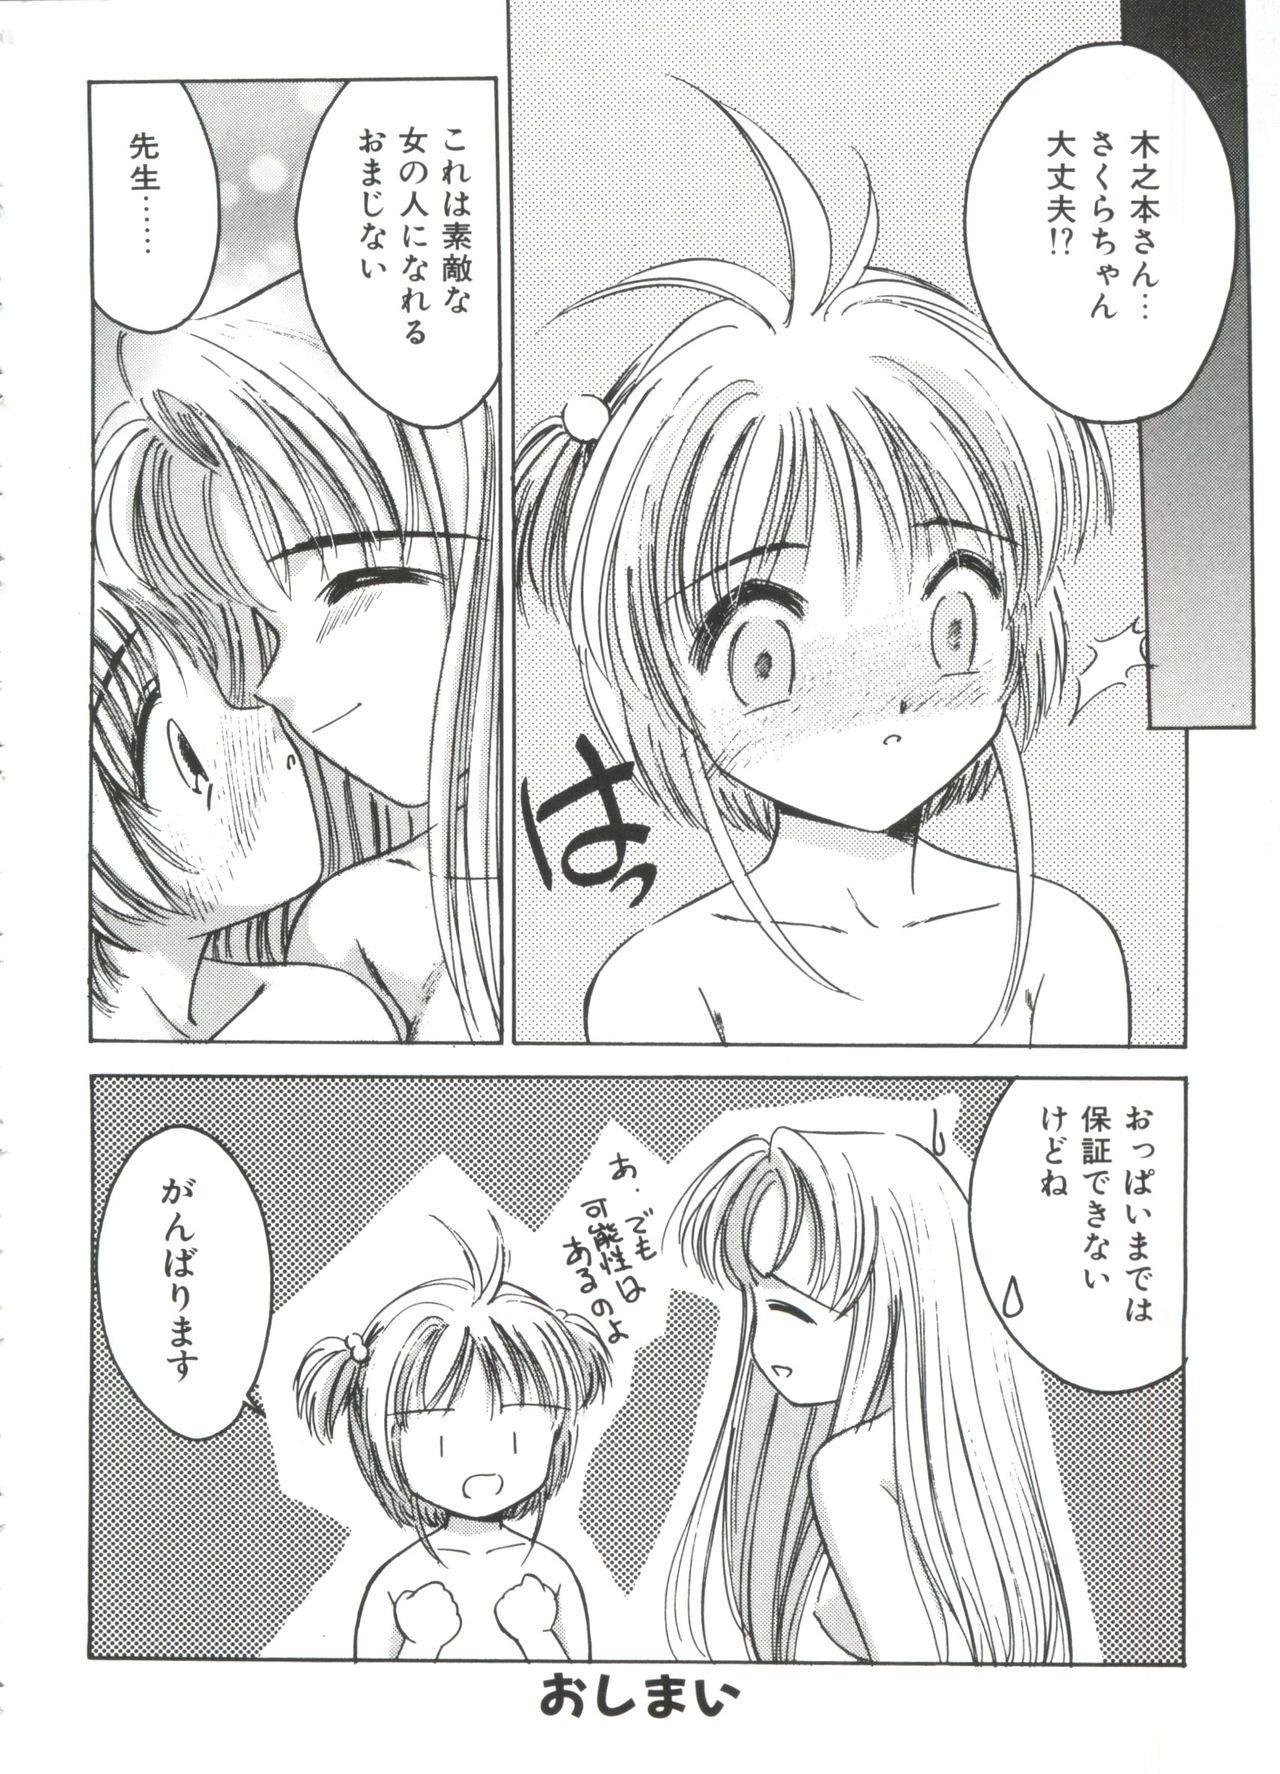 Ero-chan to Issho 2 21